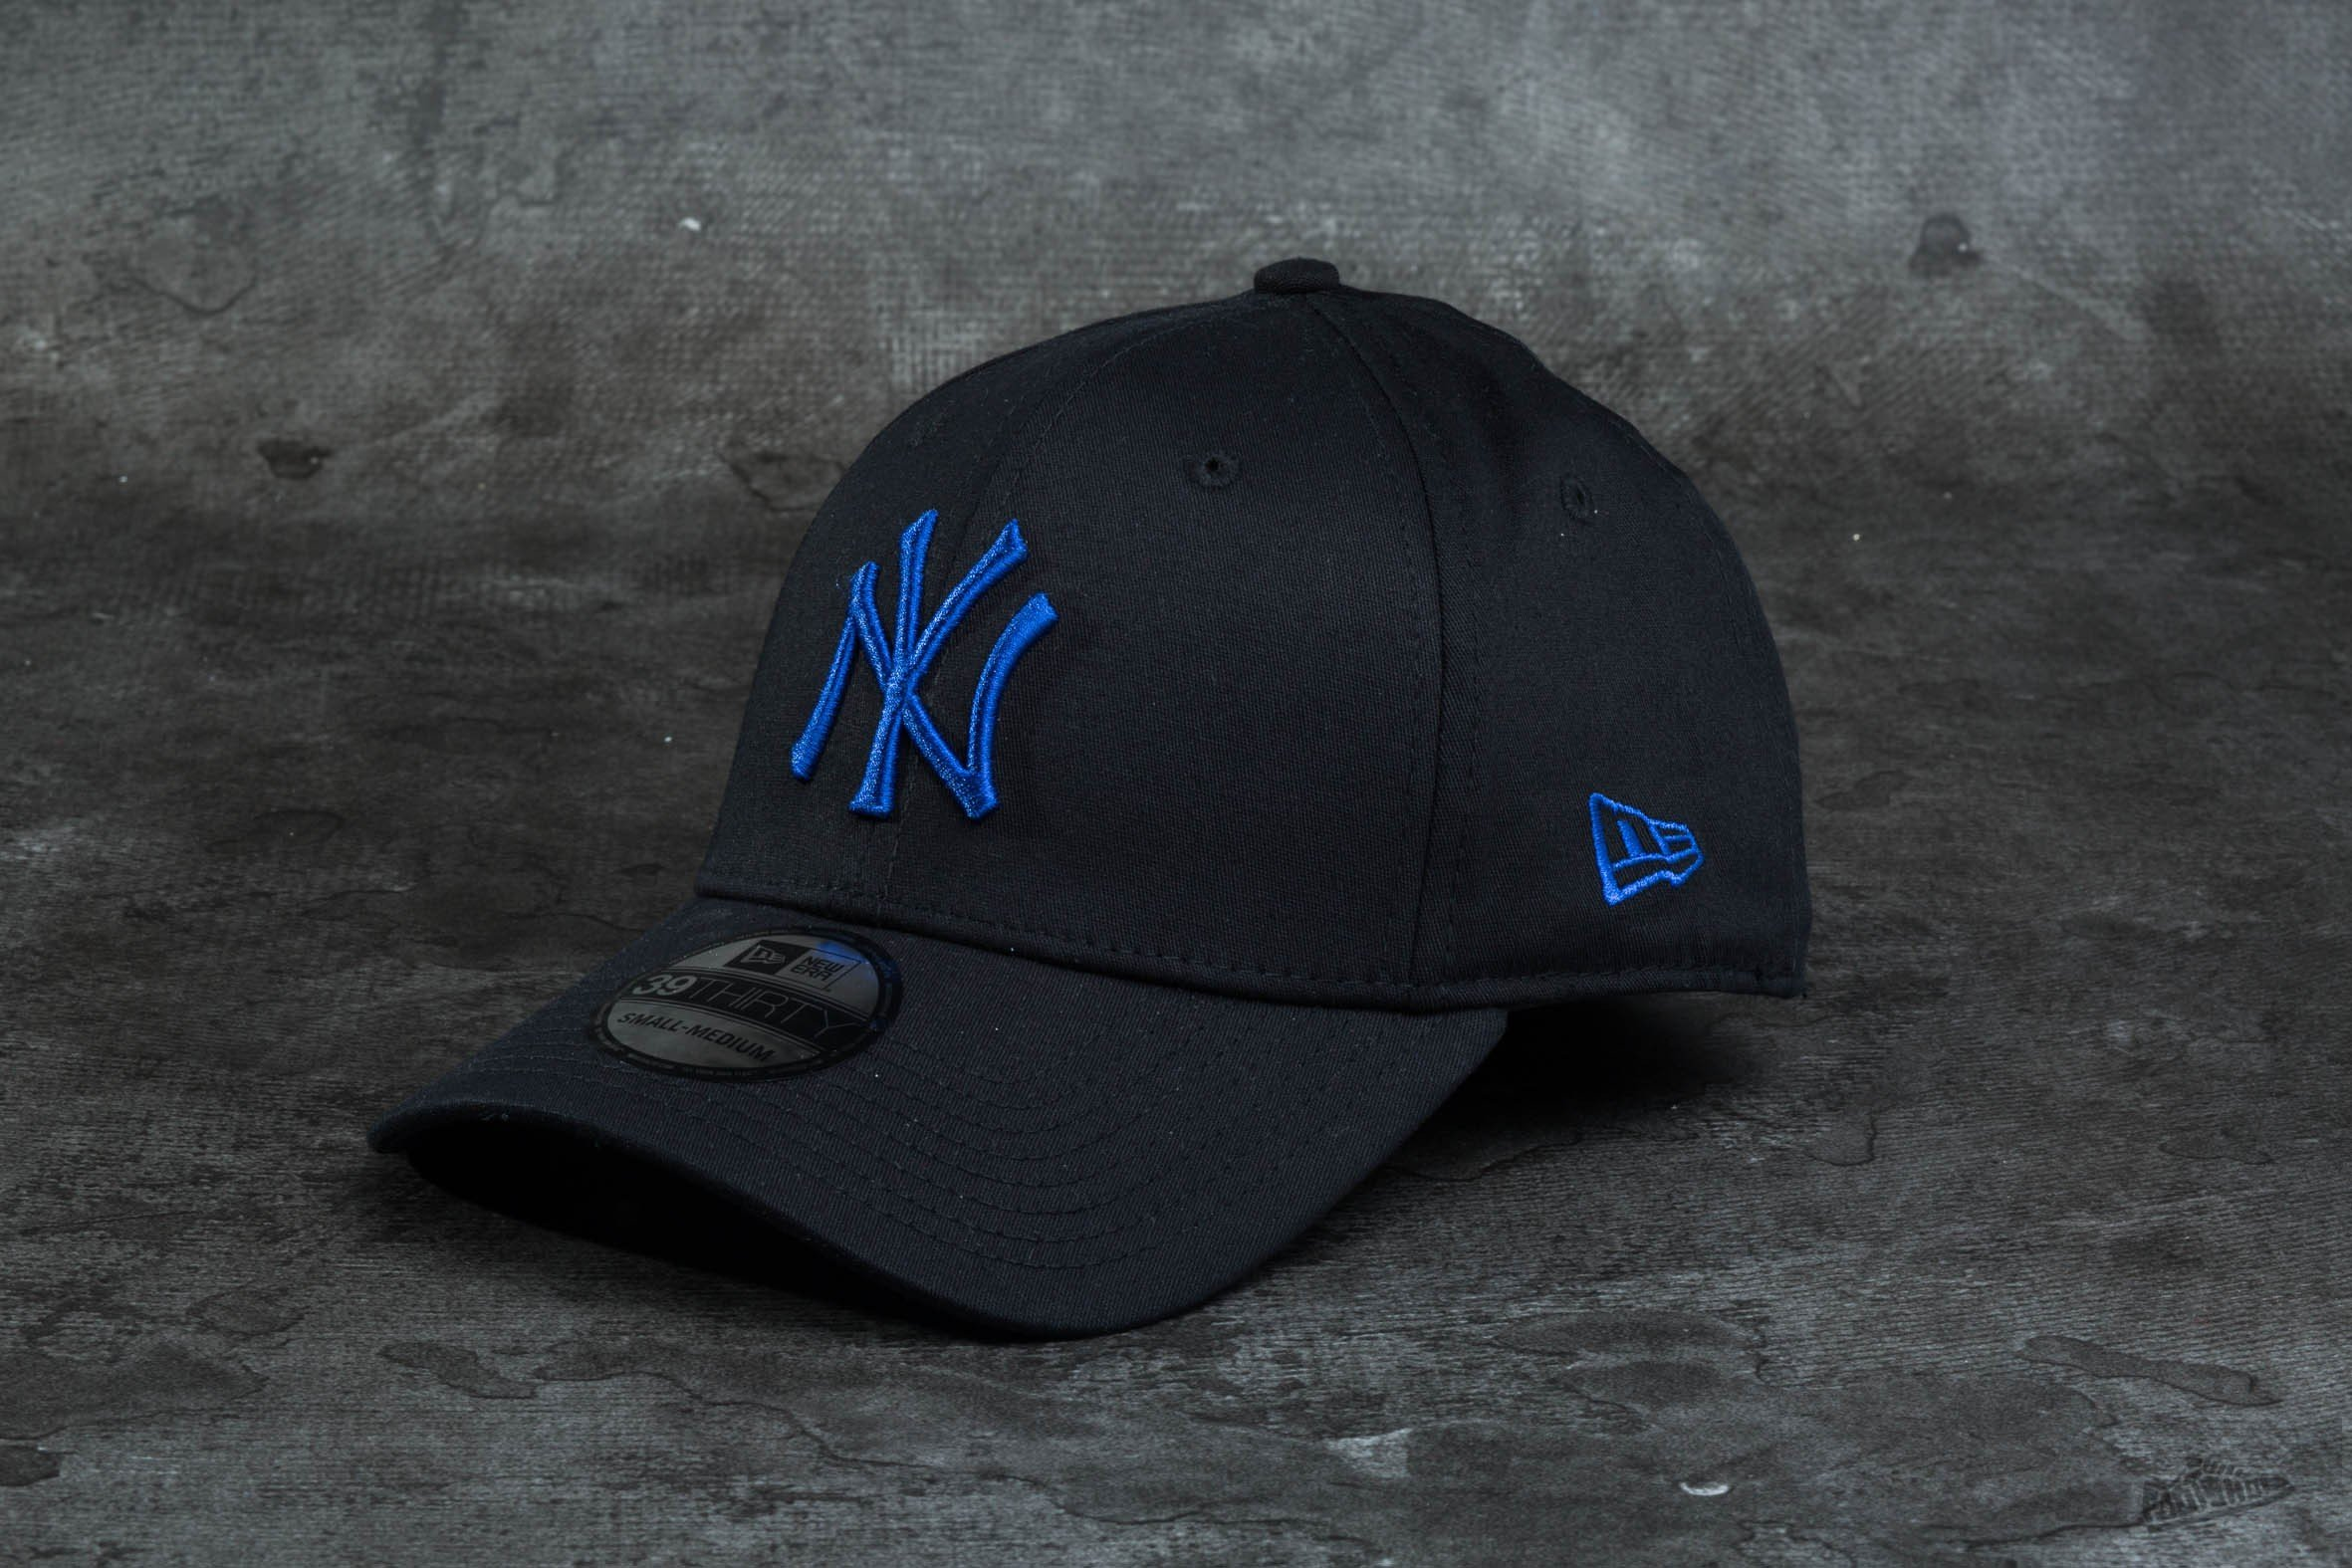 c4a0bceb433 New Era 39Thirty Black New York Yankees Black  Blue